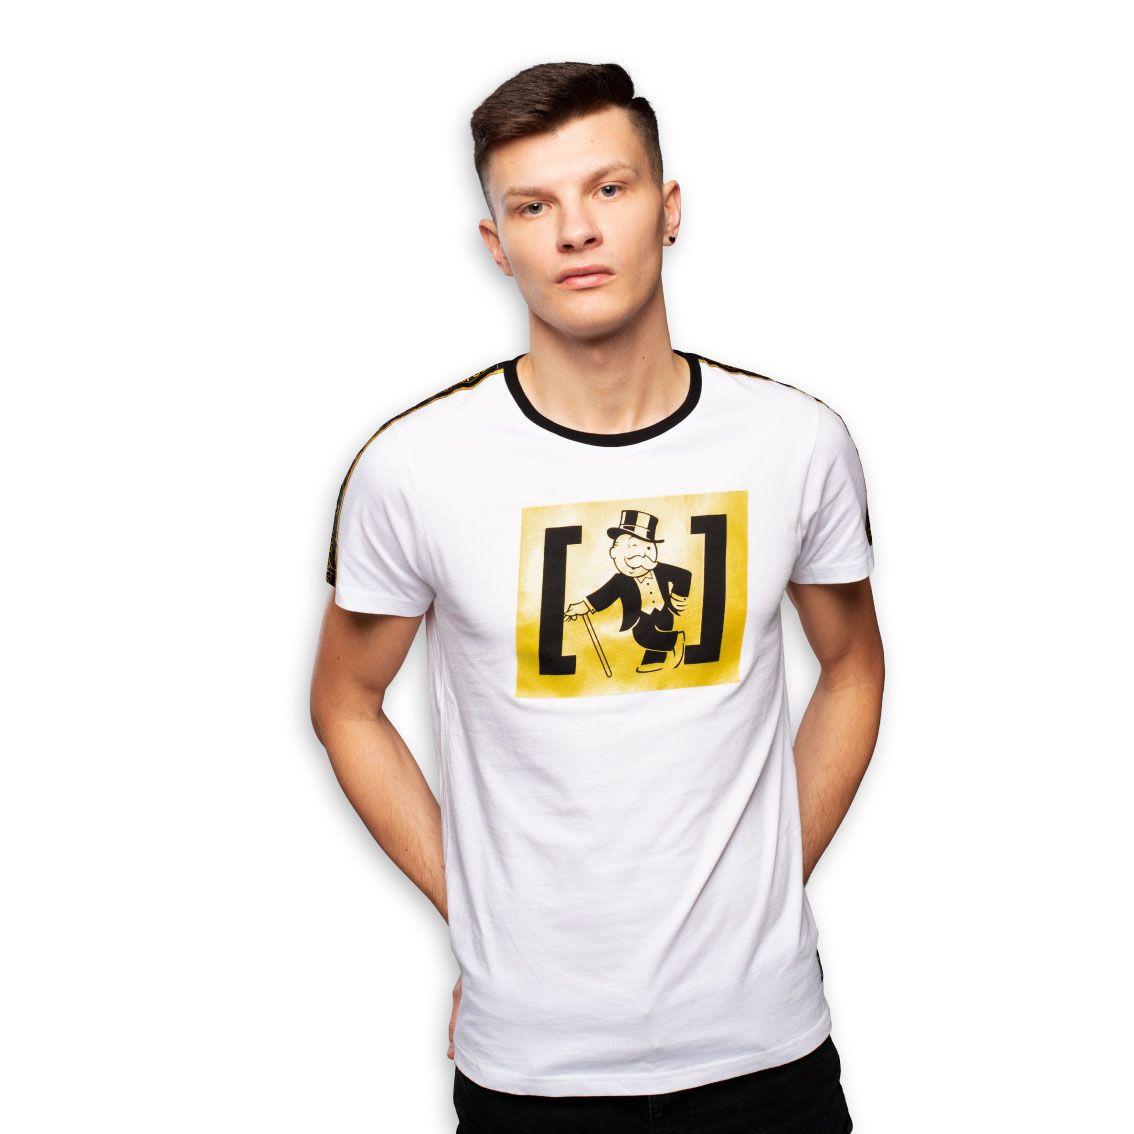 T-shirt homme monopoly rich blanc